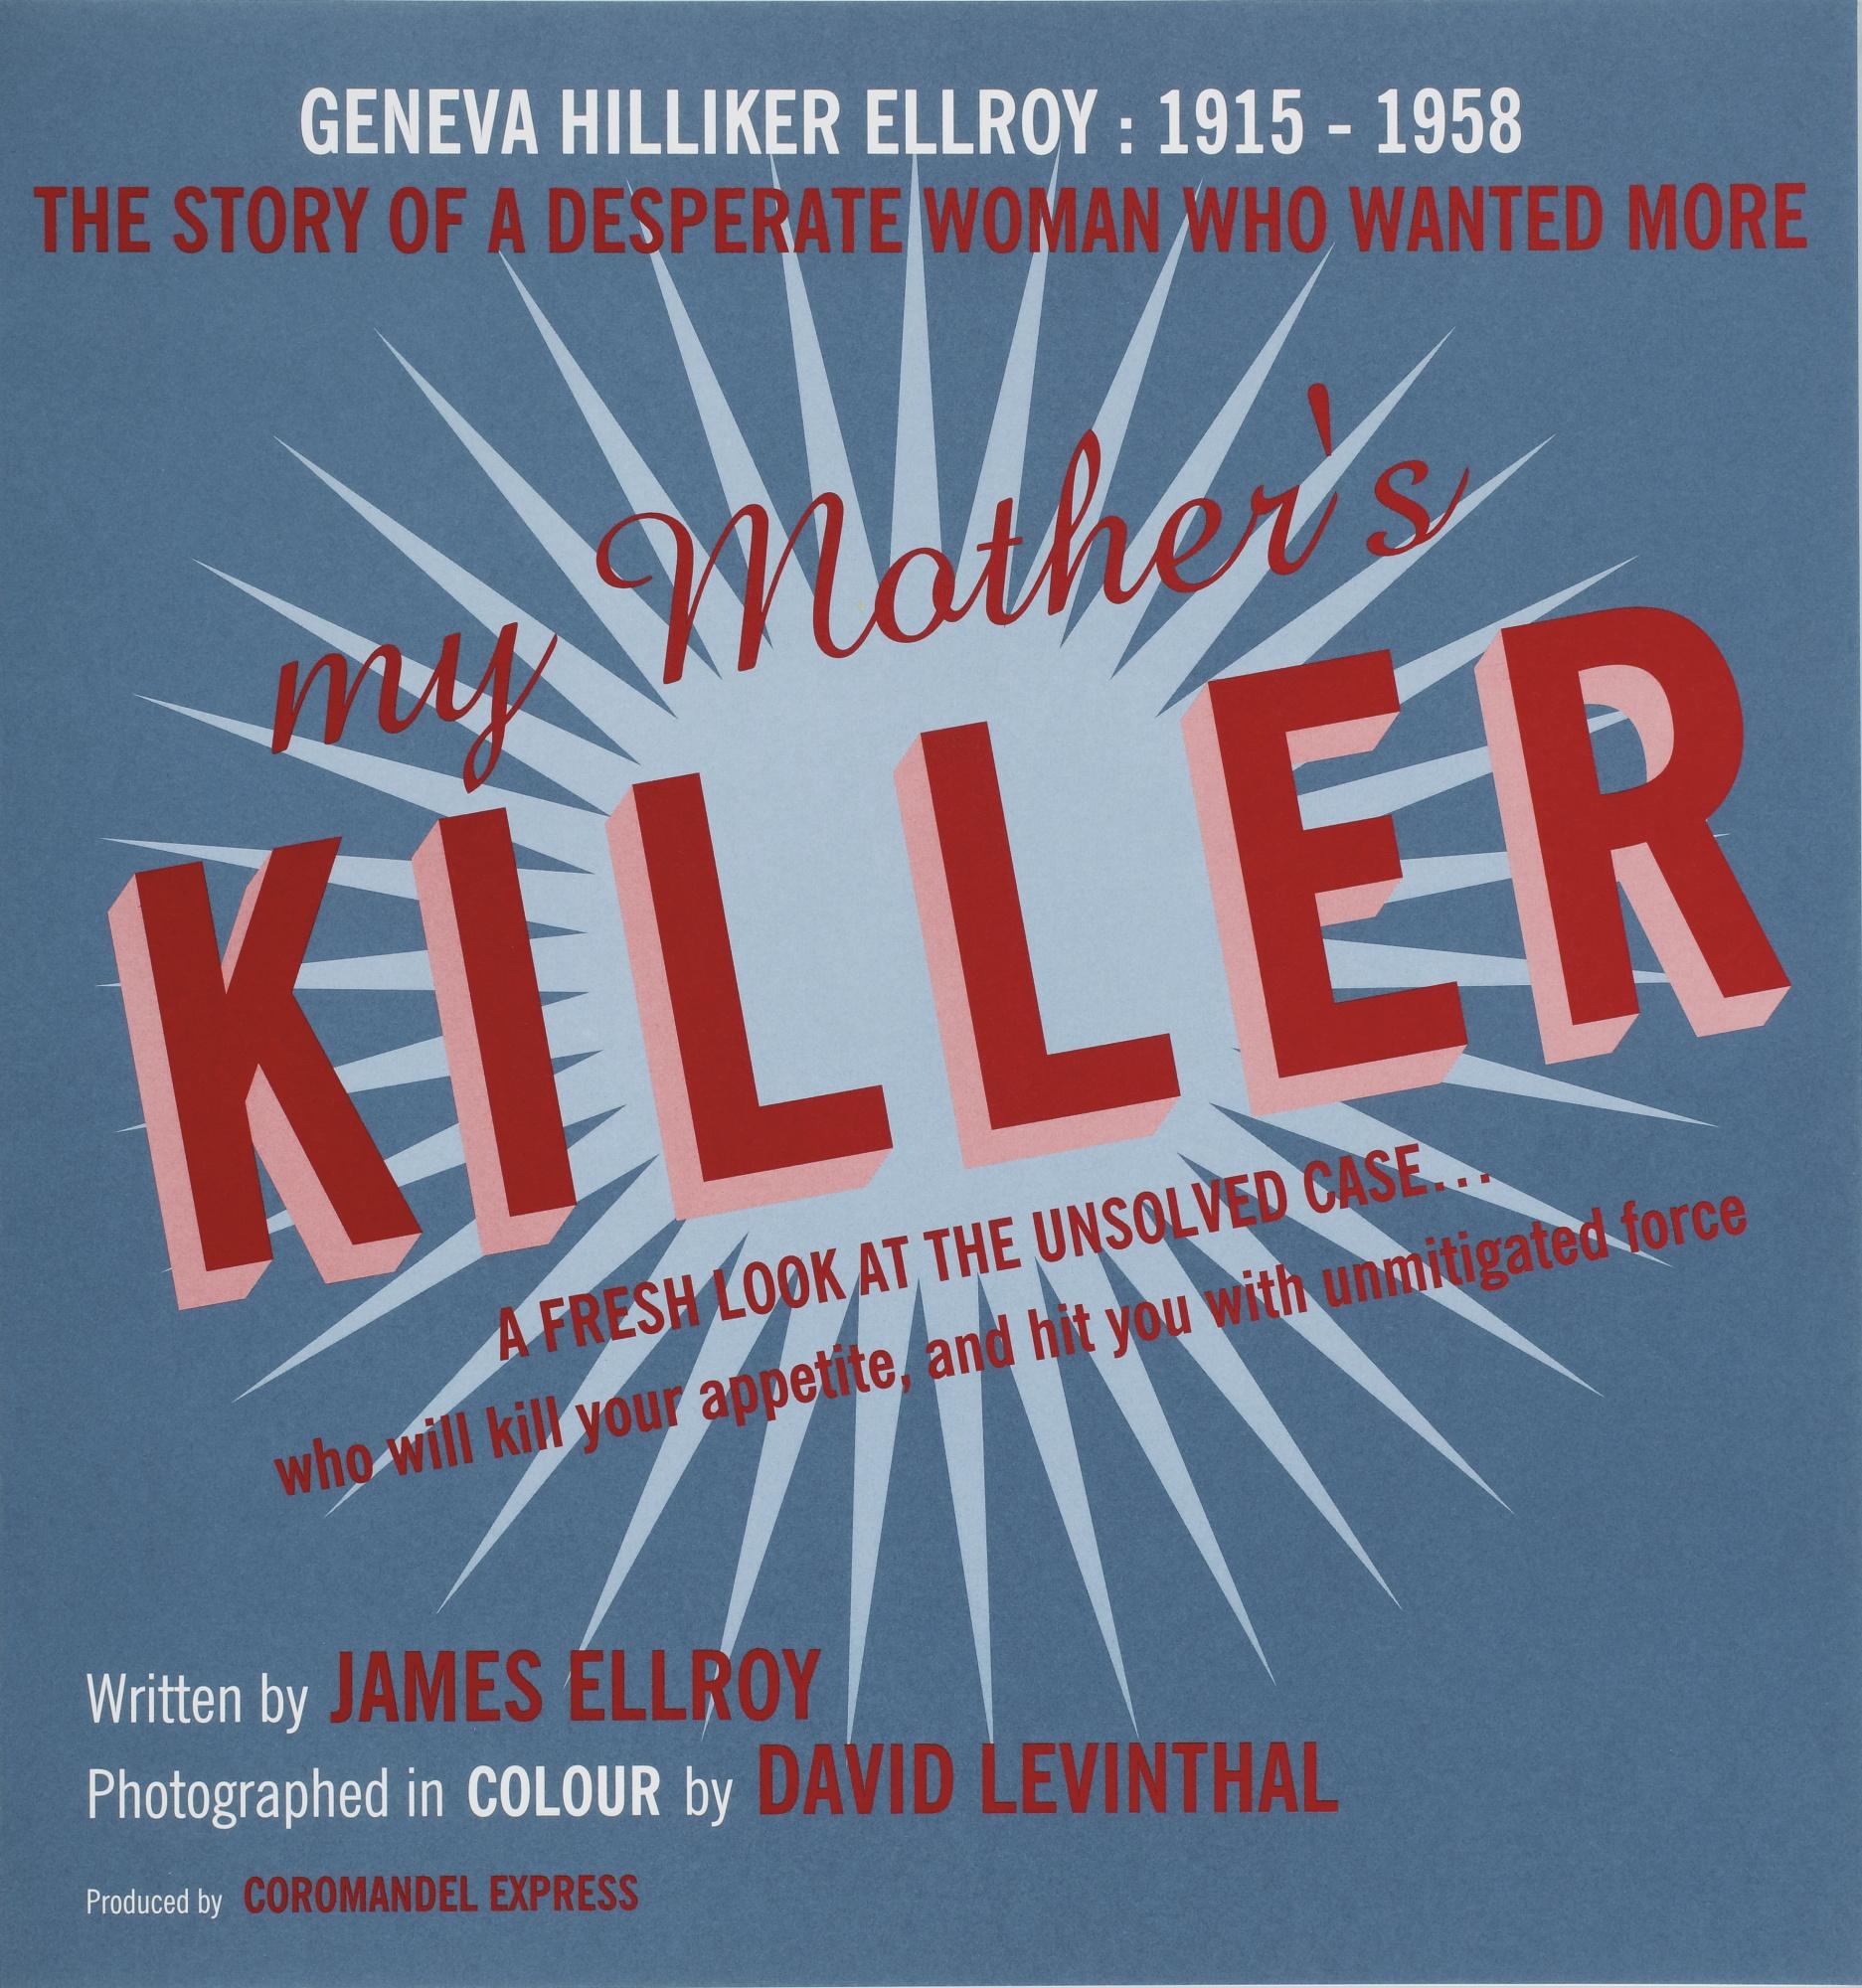 David Levinthal-My Mothers Killer-1998